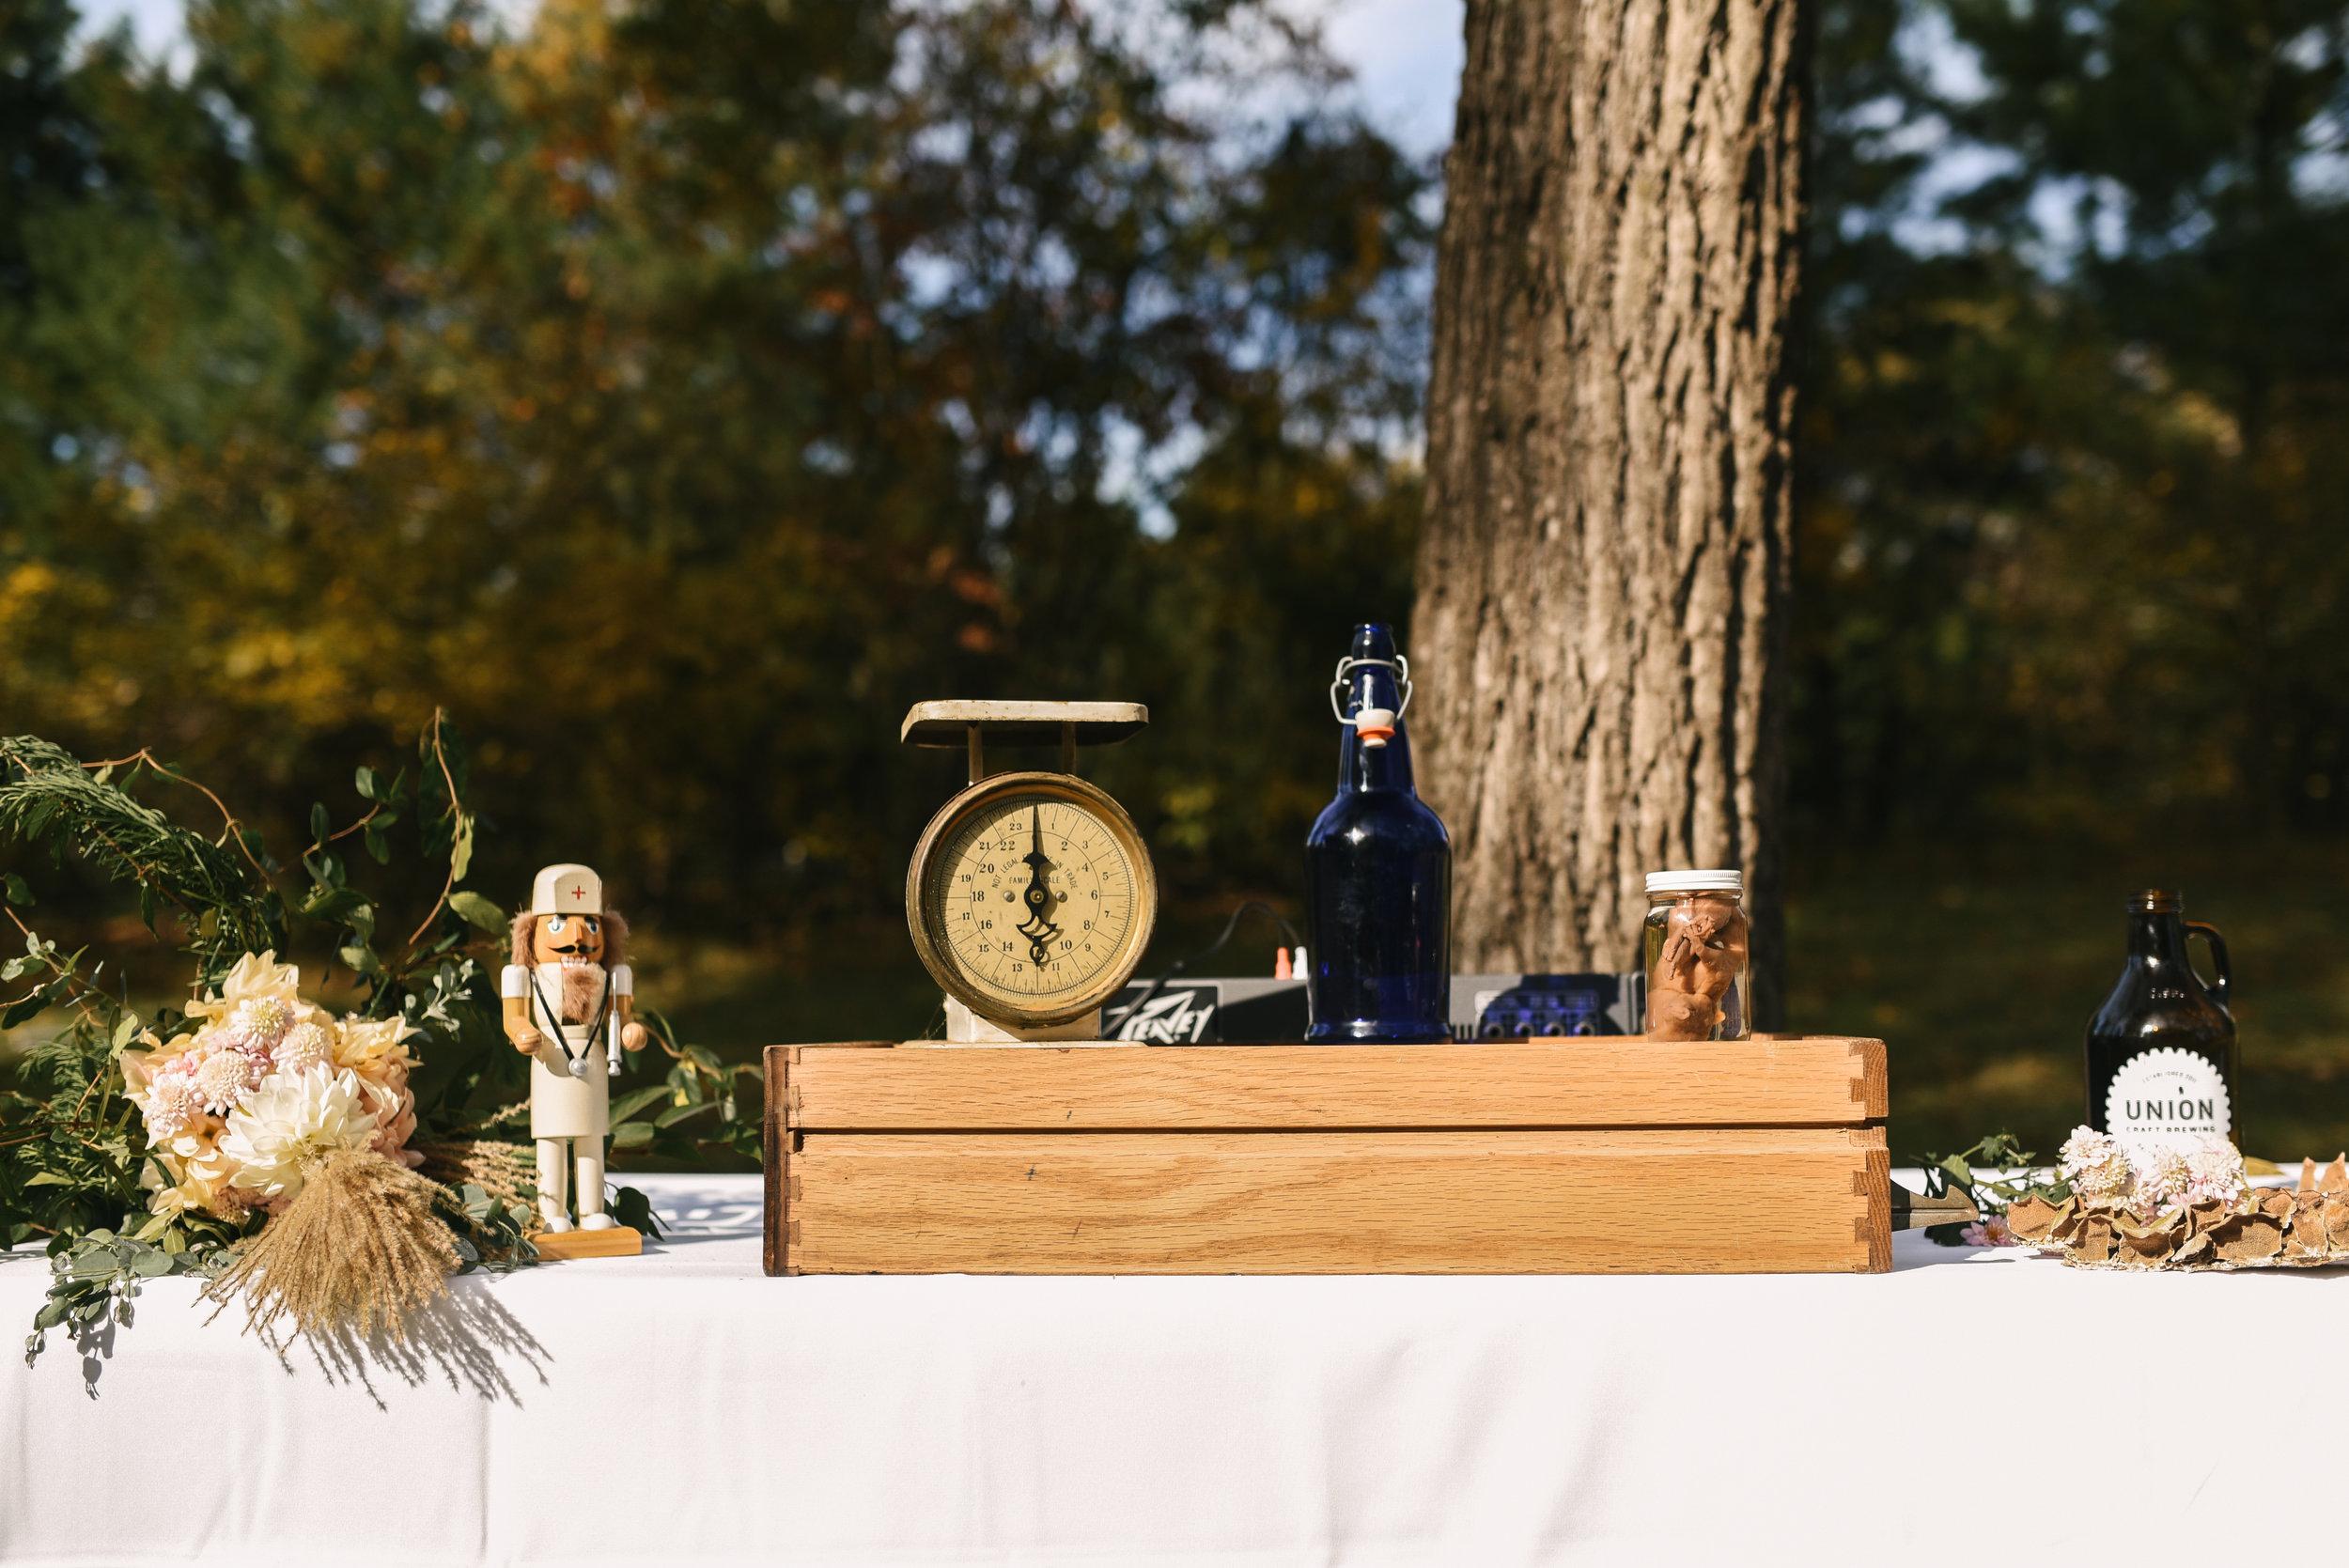 Baltimore, Maryland Wedding Photographer, Backyard Wedding, DIY, Rustic, Casual, Fall Wedding, Woodland, Table pf Decor at Reception, Crooked Fence Farm